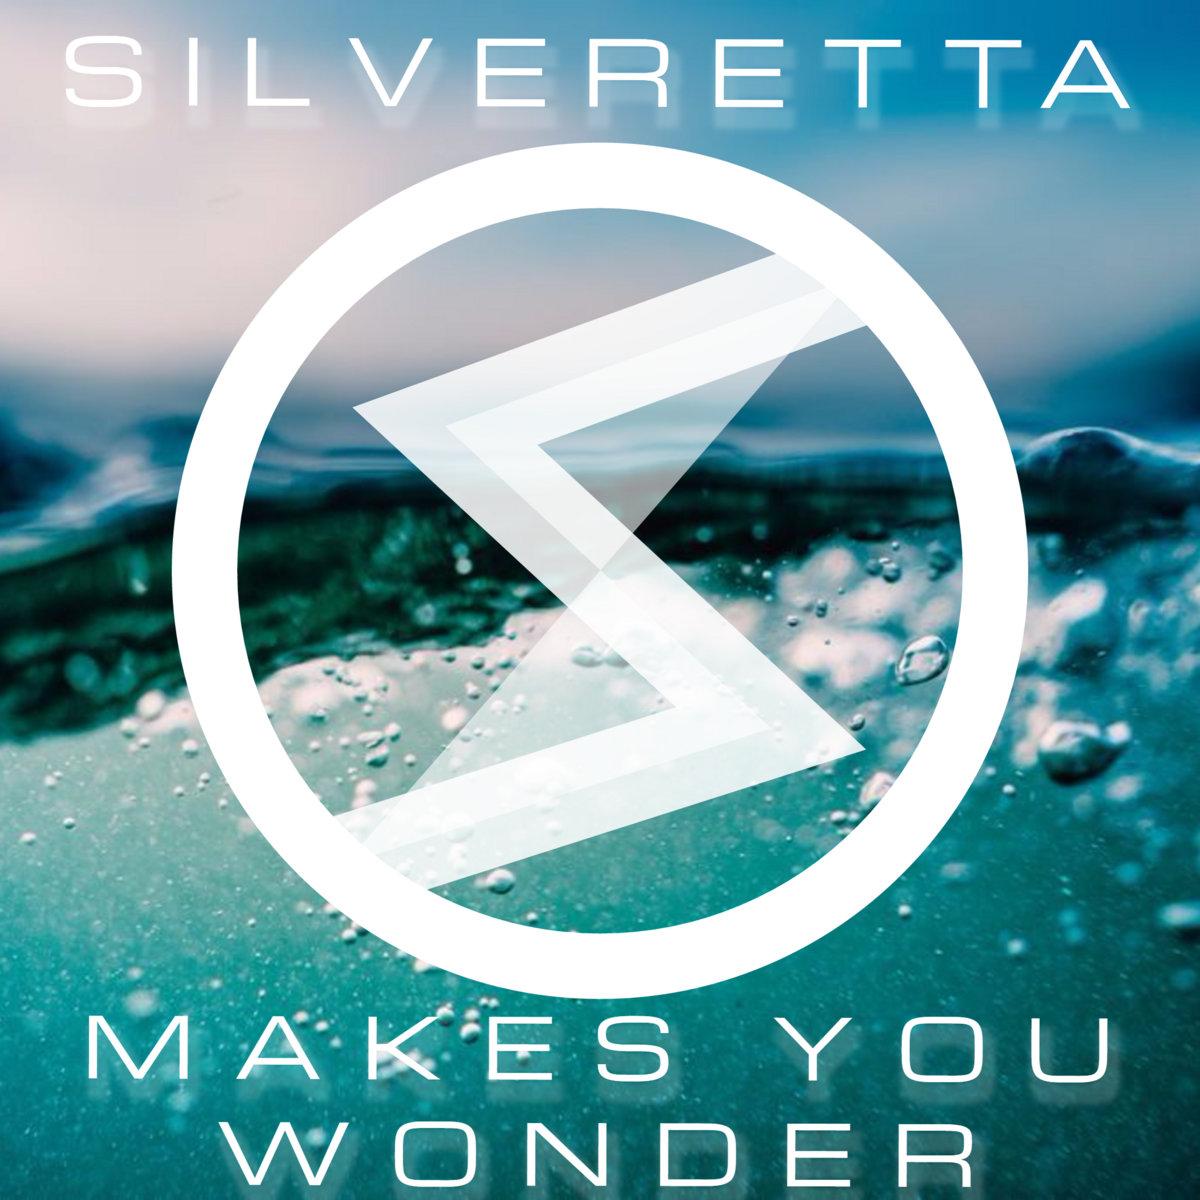 Makes You Wonder Mixes | Pierce G Project